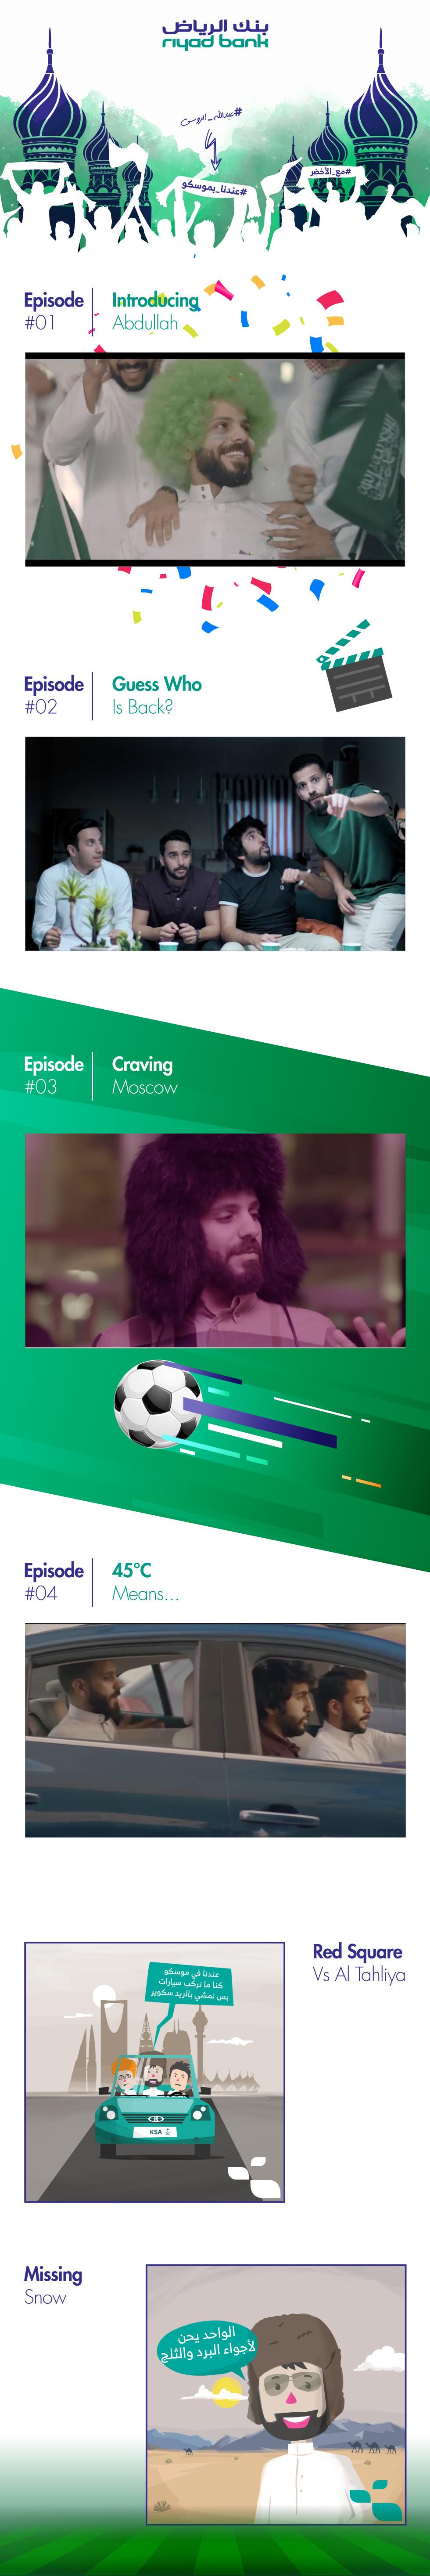 Riyad Bank - World Cup 2018 Digital/Social Media Campaign